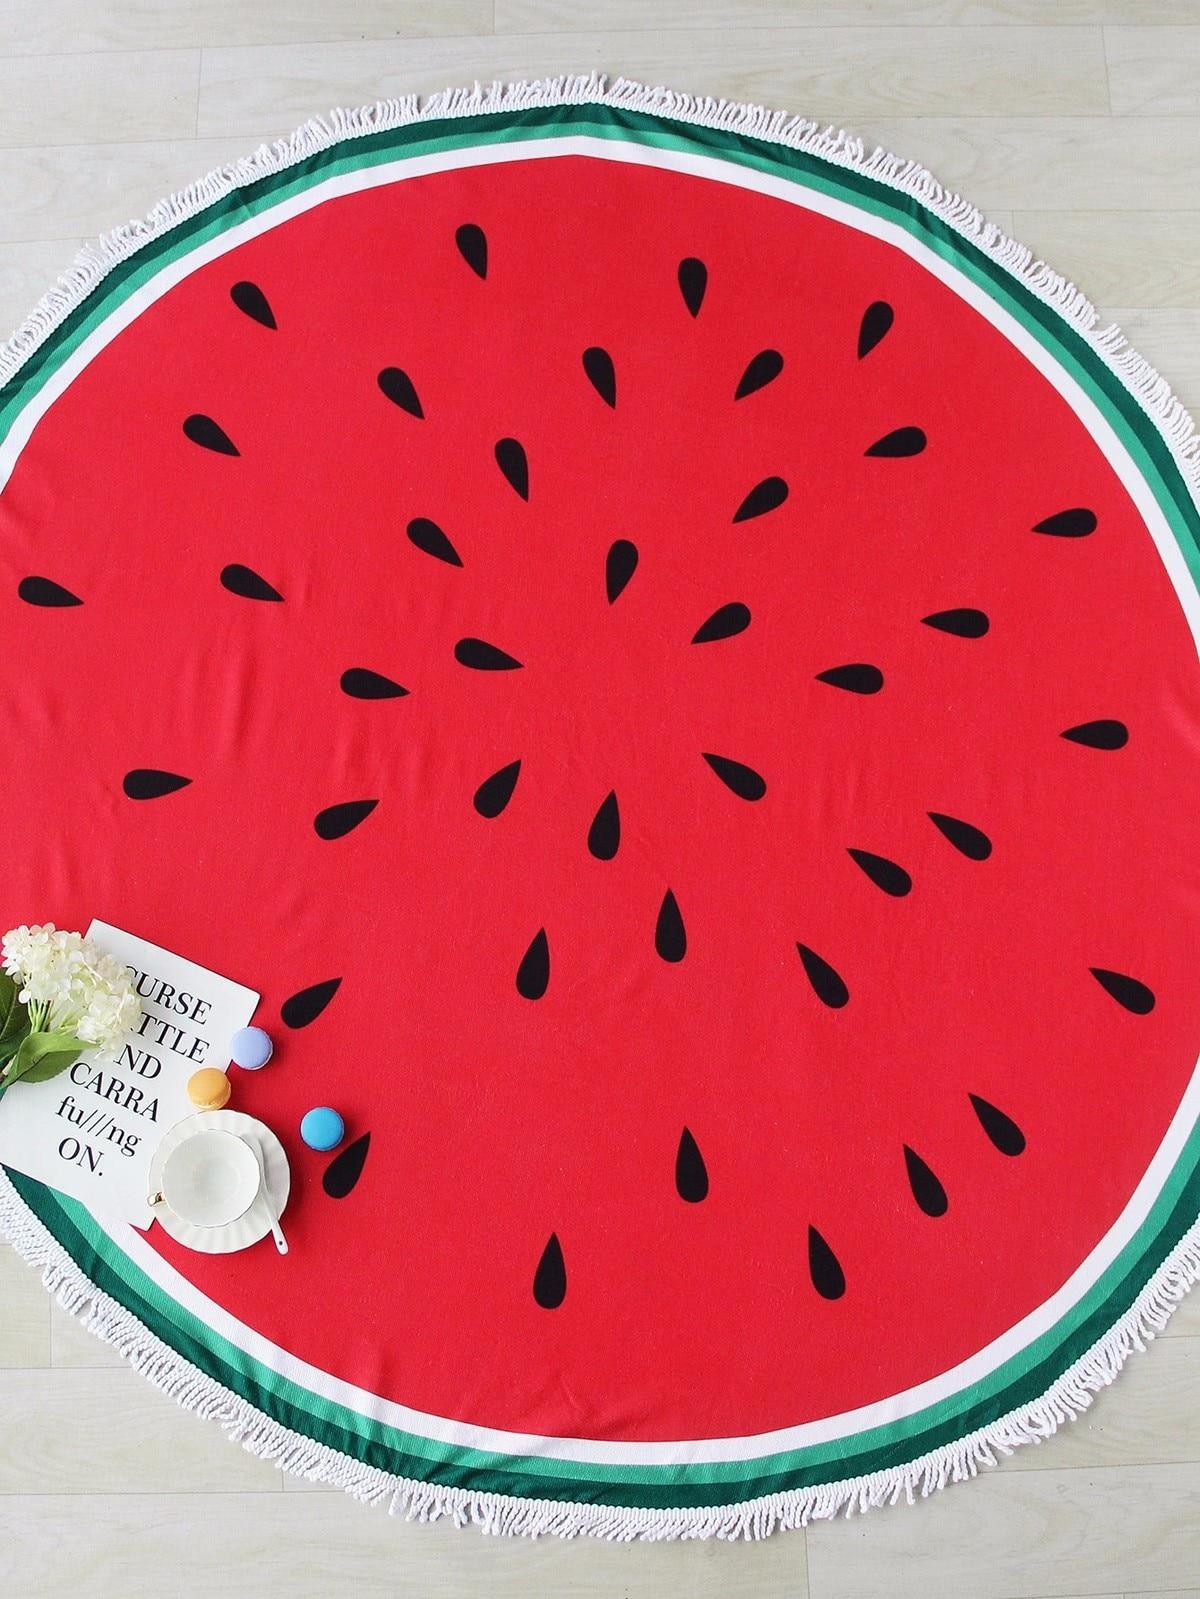 Donut Pizza Pineapple Large Round Microfiber Beach Towel Circle Tassels Watermelon Hamburger Cotton Bath Mat Serviette De Plage